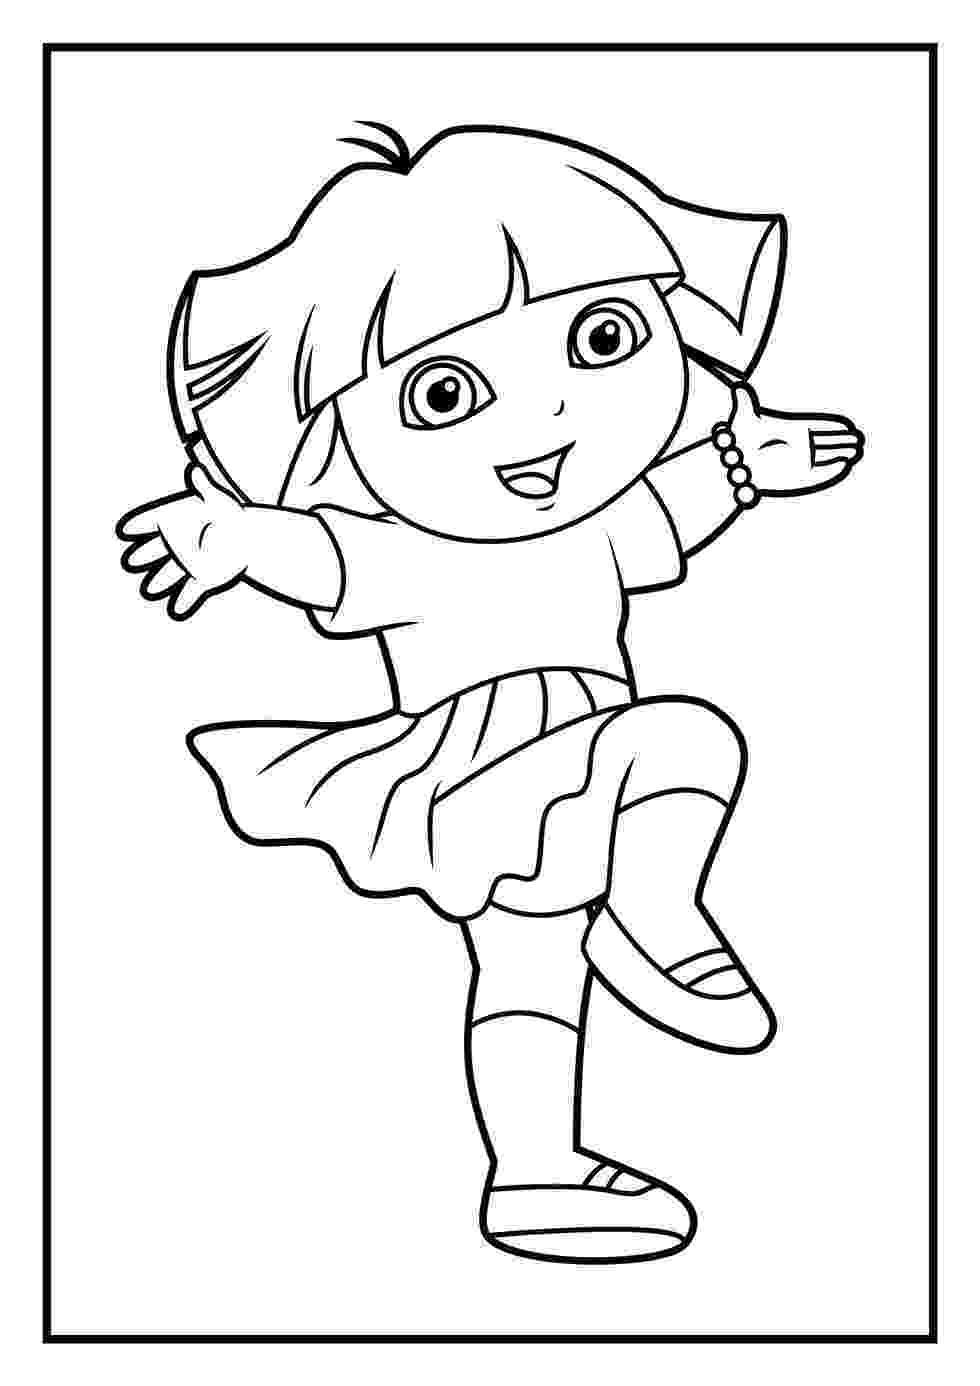 printable coloring dora printable dora coloring pages free printable coloring printable dora coloring